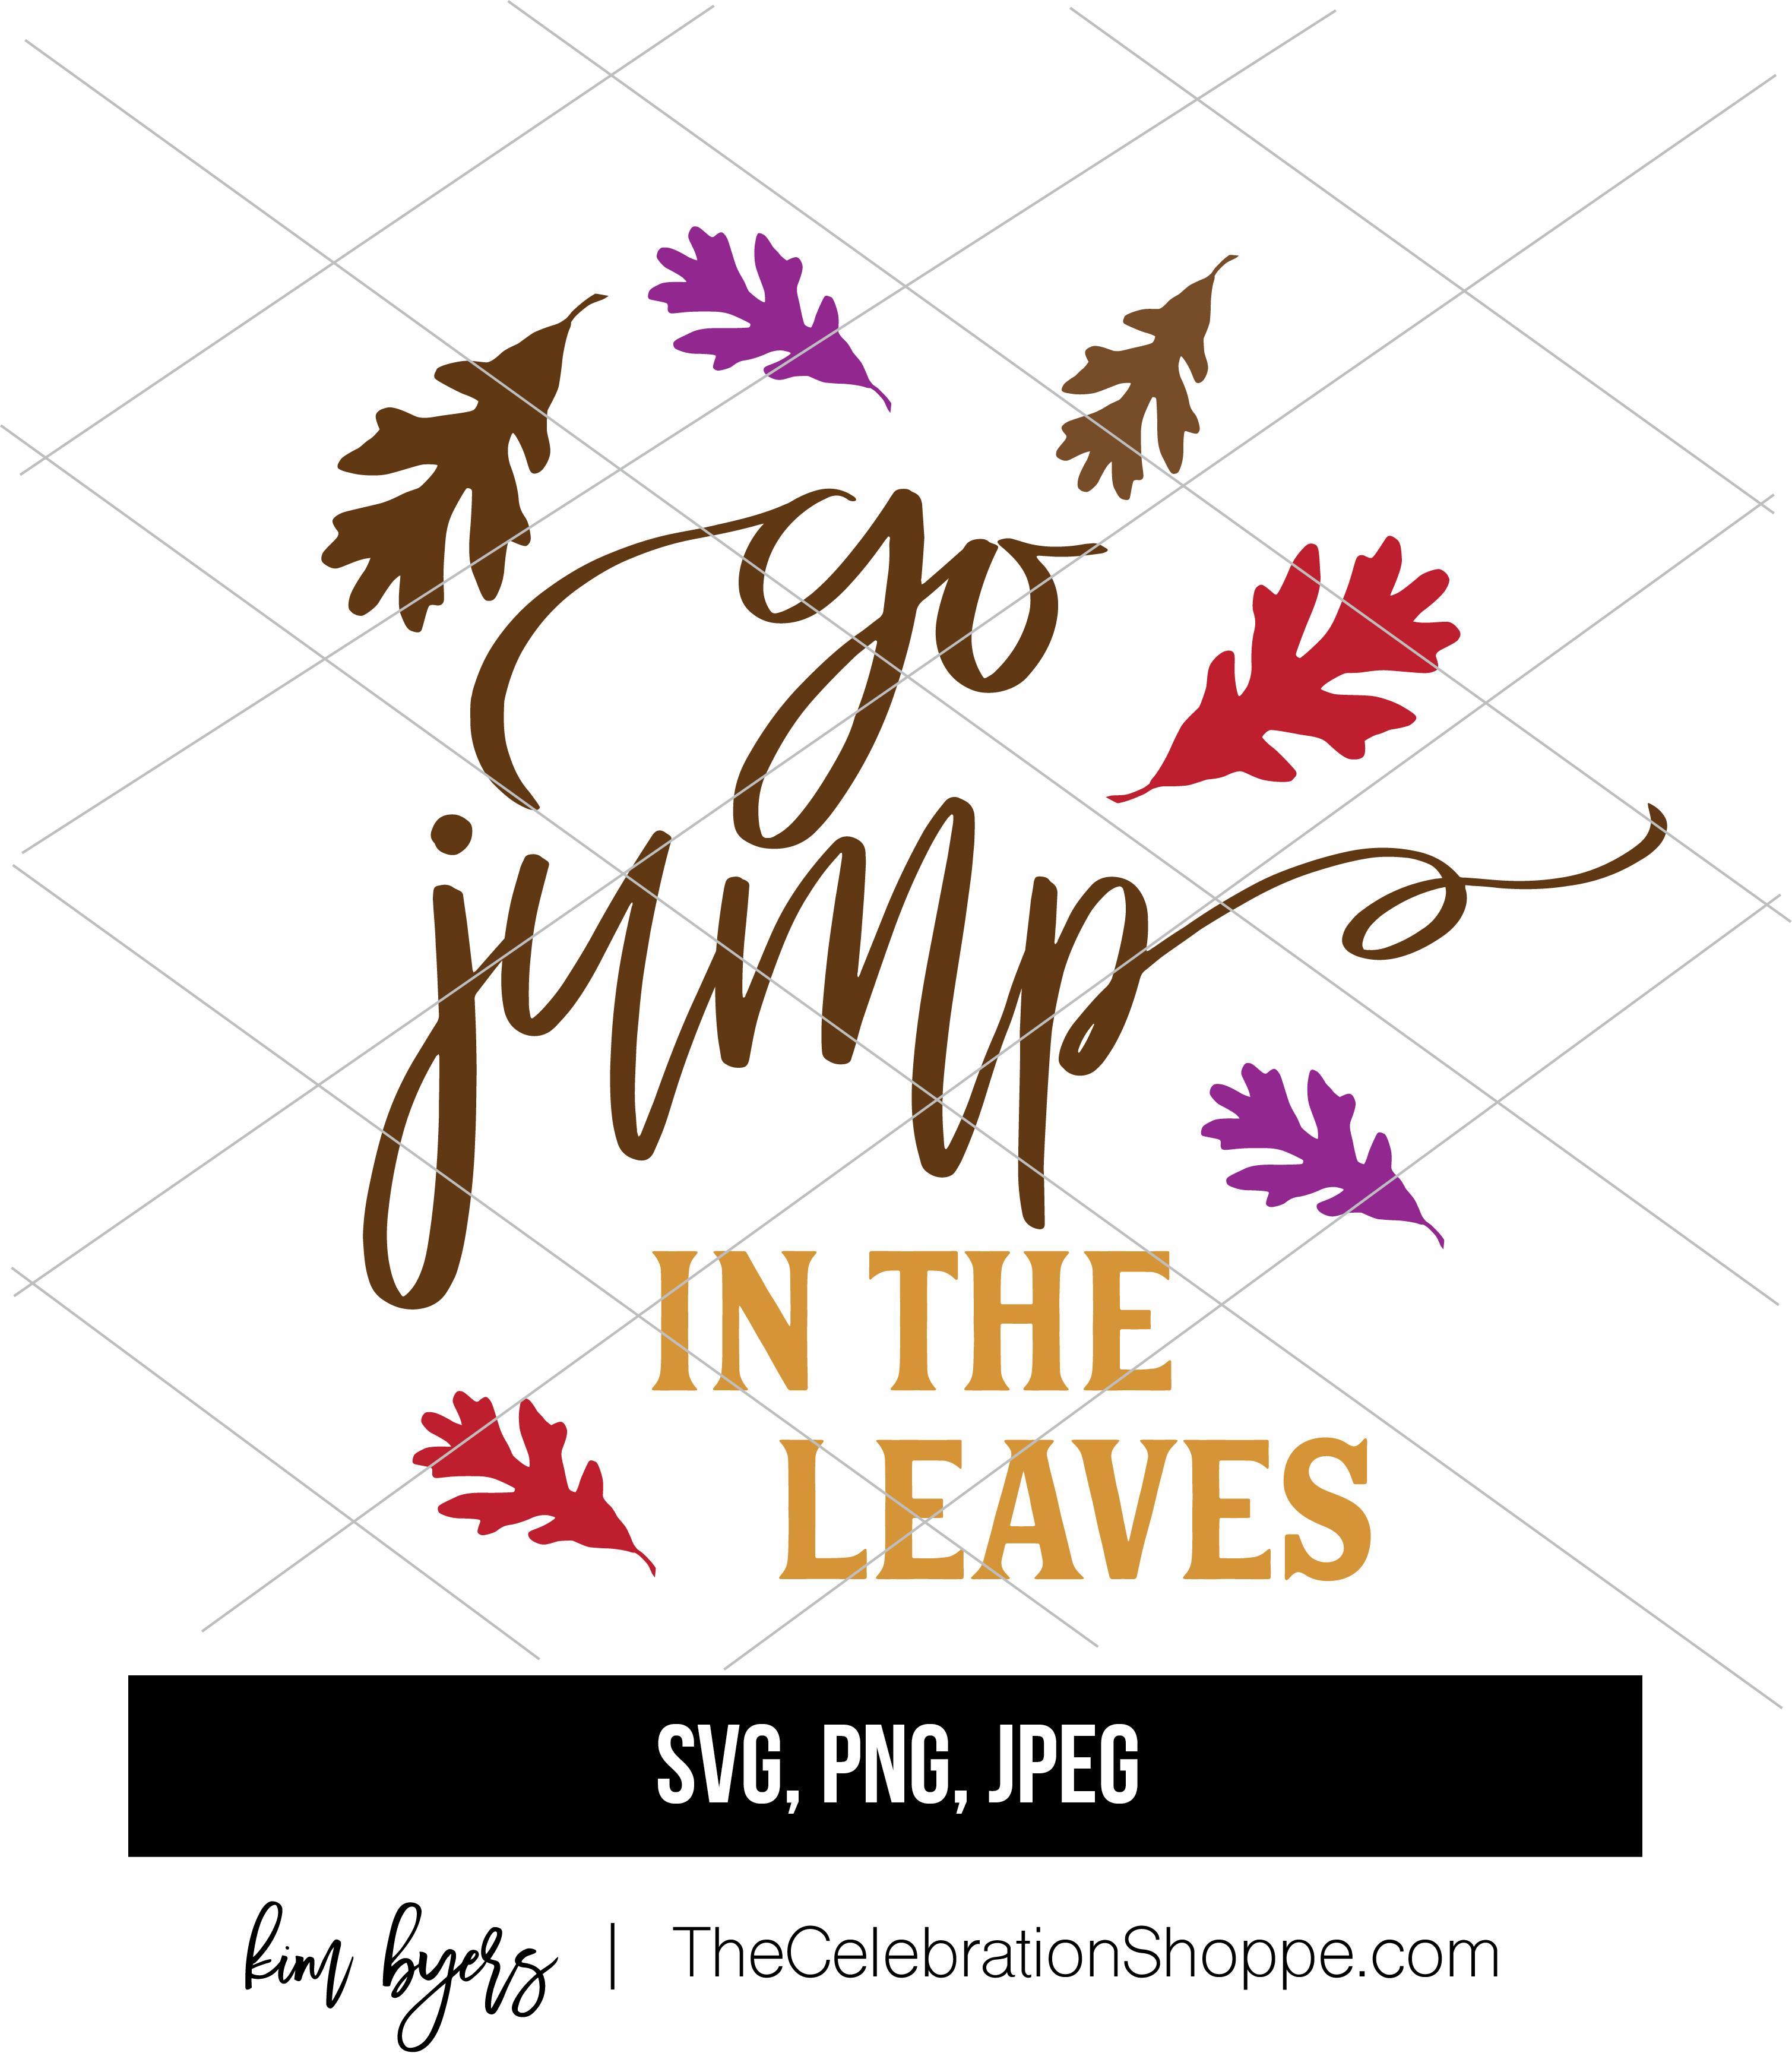 Leaves SVG | Designed by Kim Byers